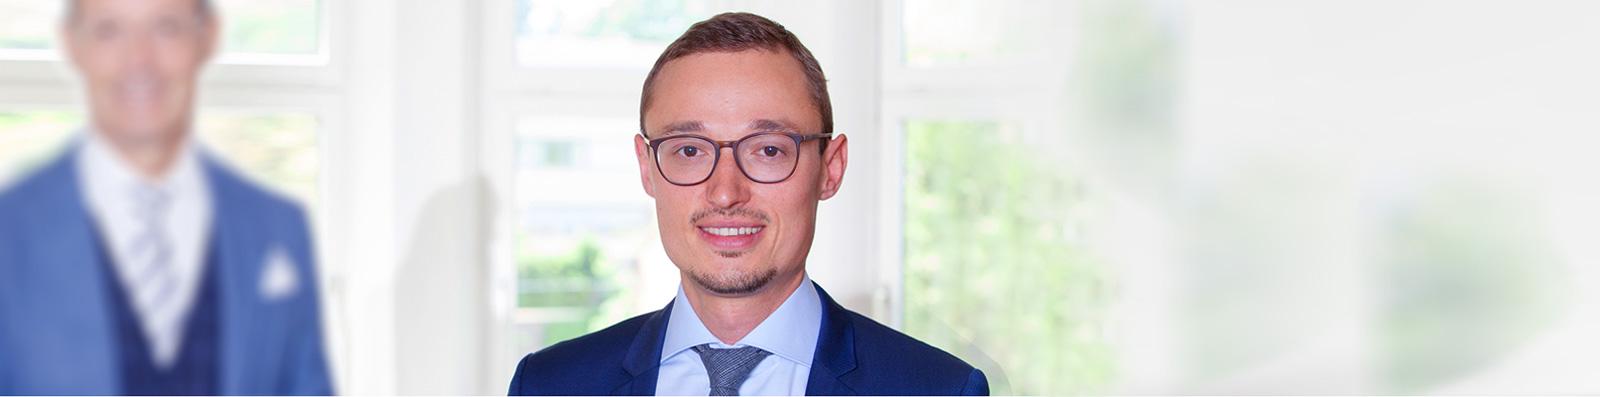 Kanzleiteam - Christian Steinhart